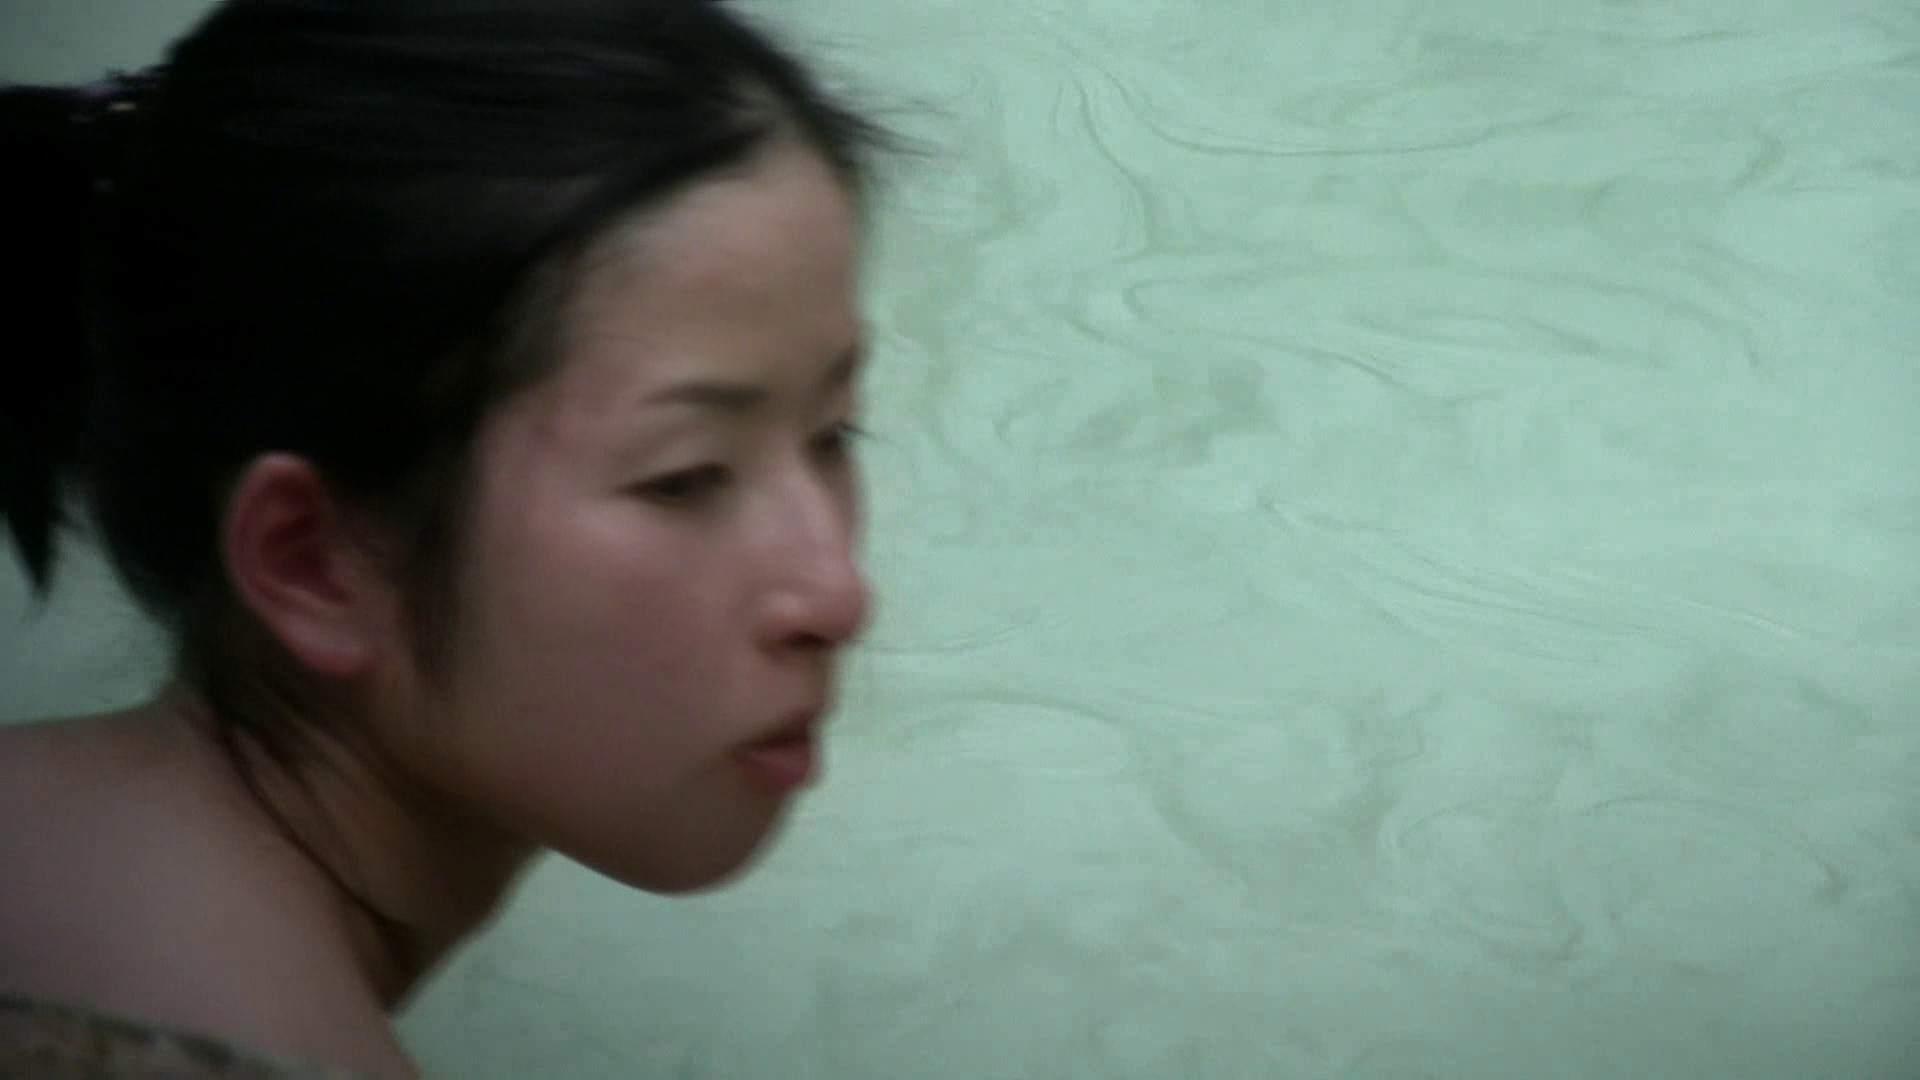 Aquaな露天風呂Vol.656 盗撮 AV無料 72画像 35